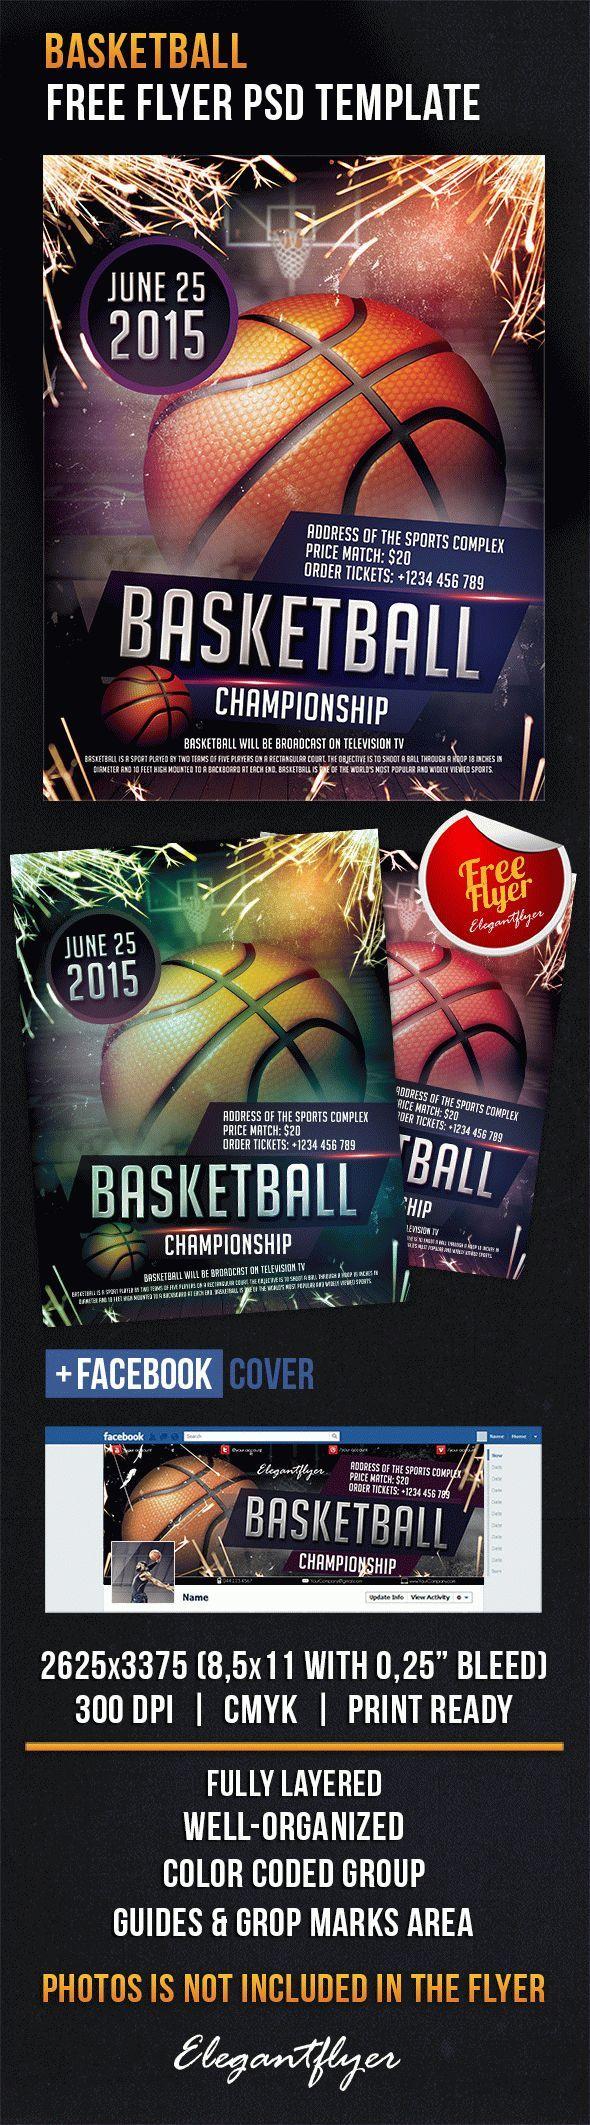 Basketball – Free Flyer PSD Template + Facebook Cover